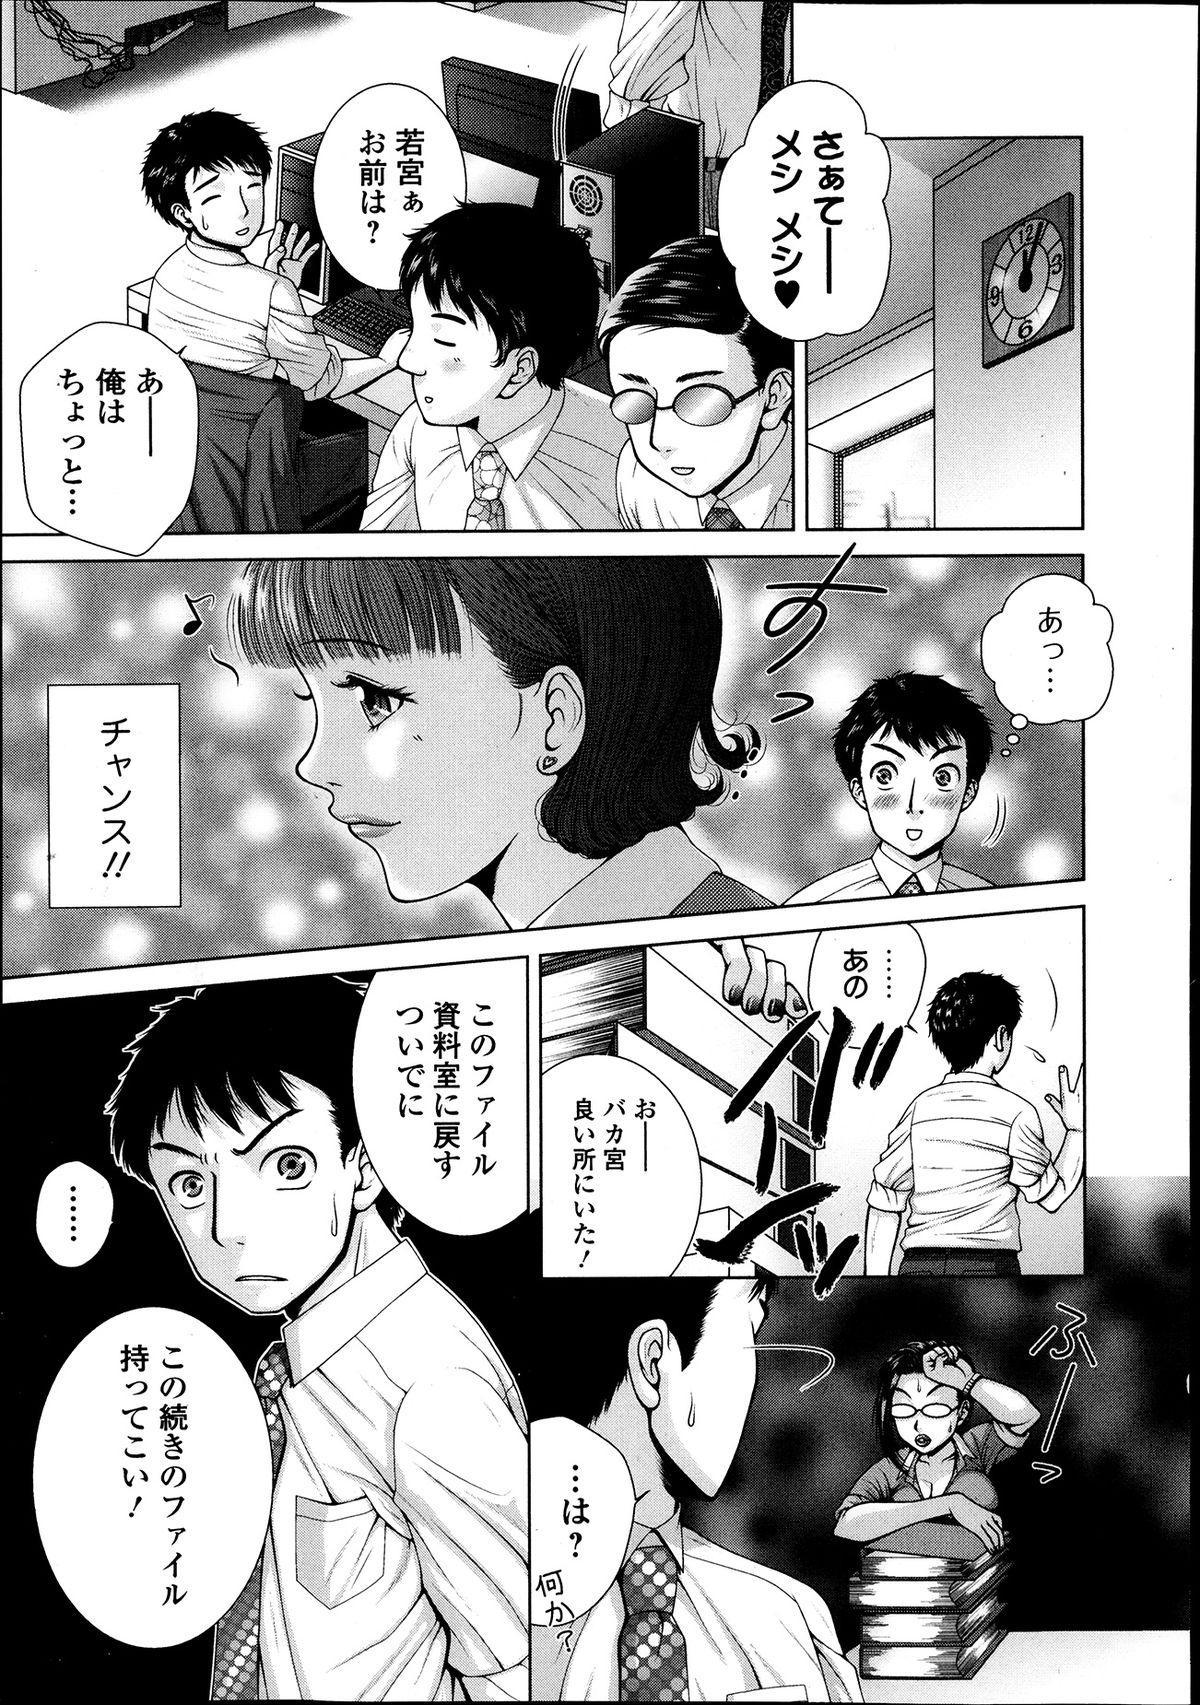 Bishoujo Kakumei KIWAME Road Vol.9 160